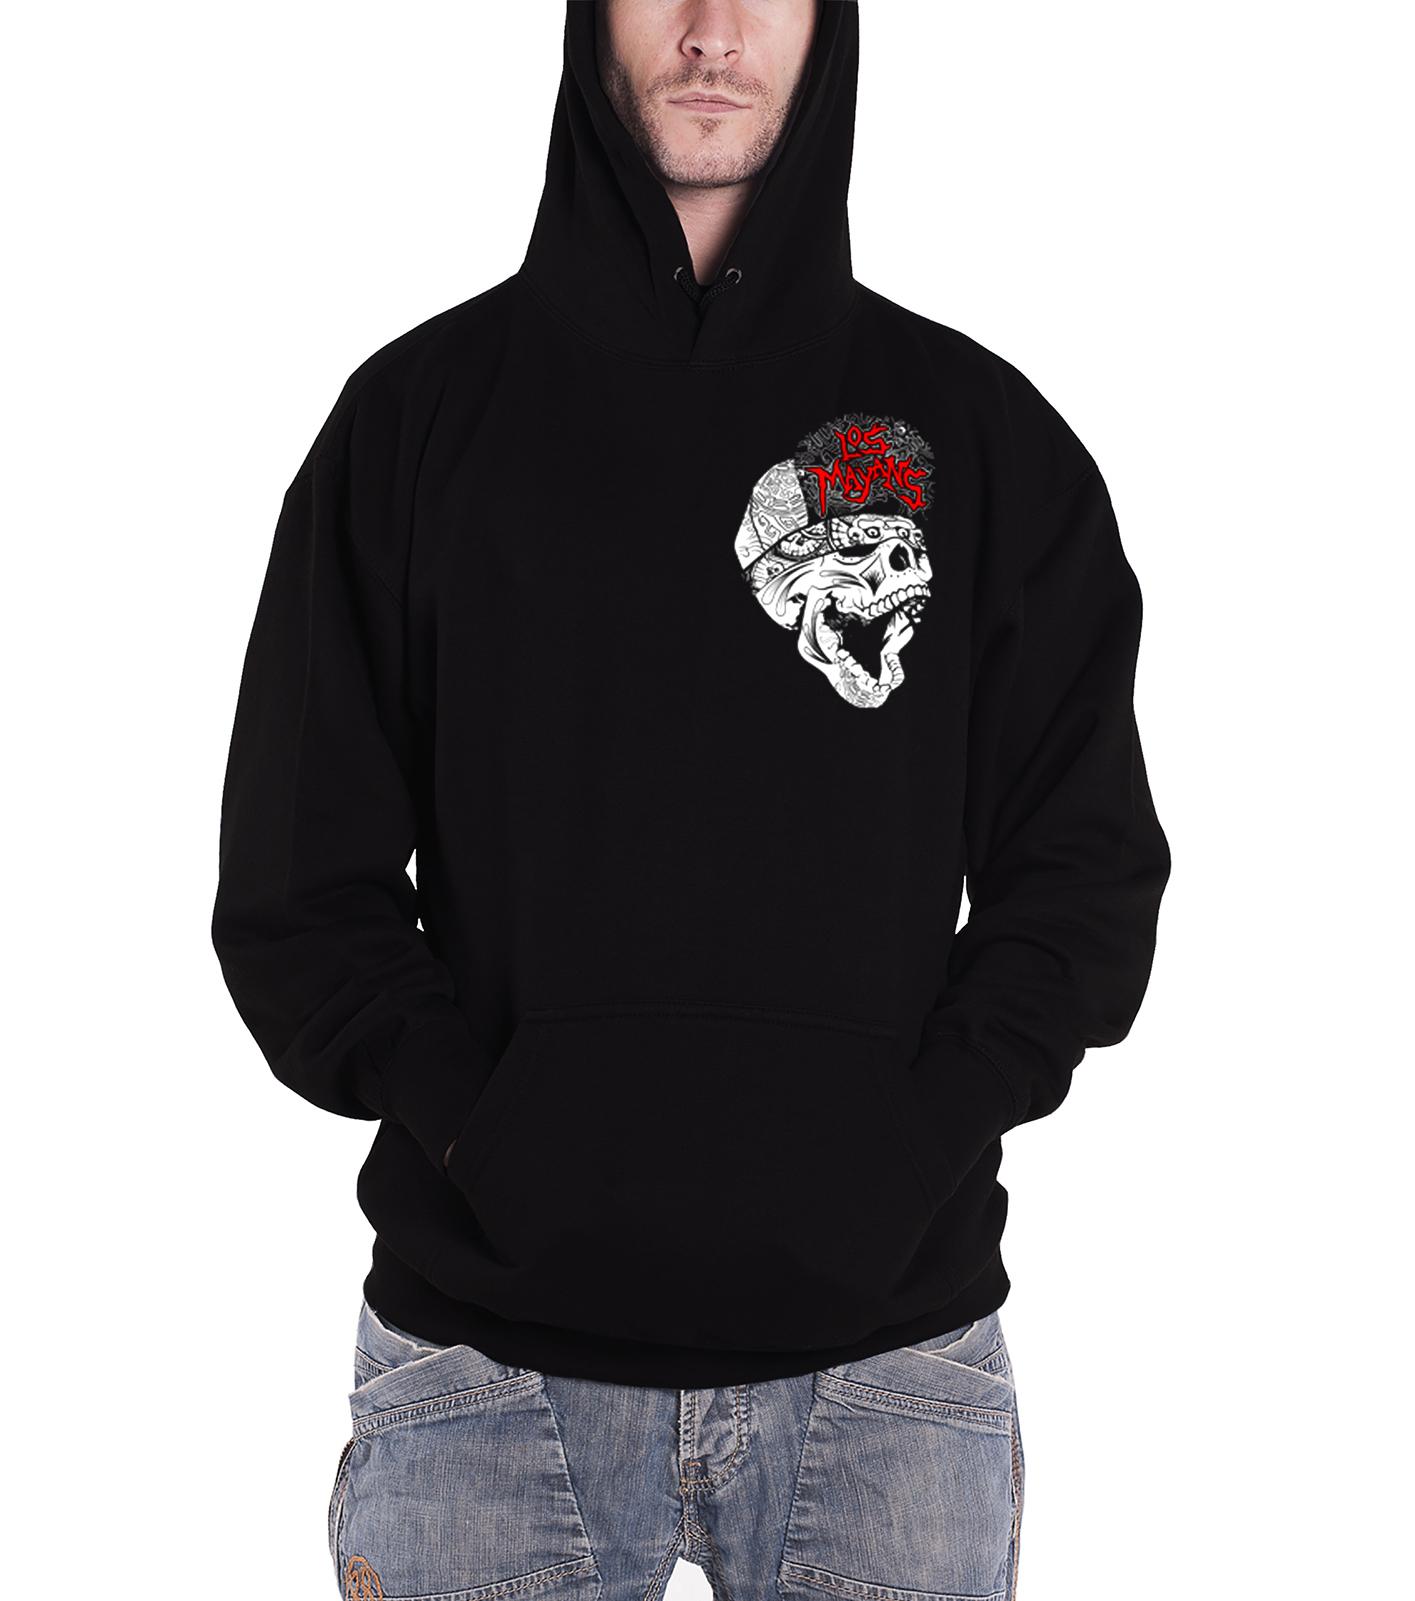 Sons of anarchy reaper hoodie